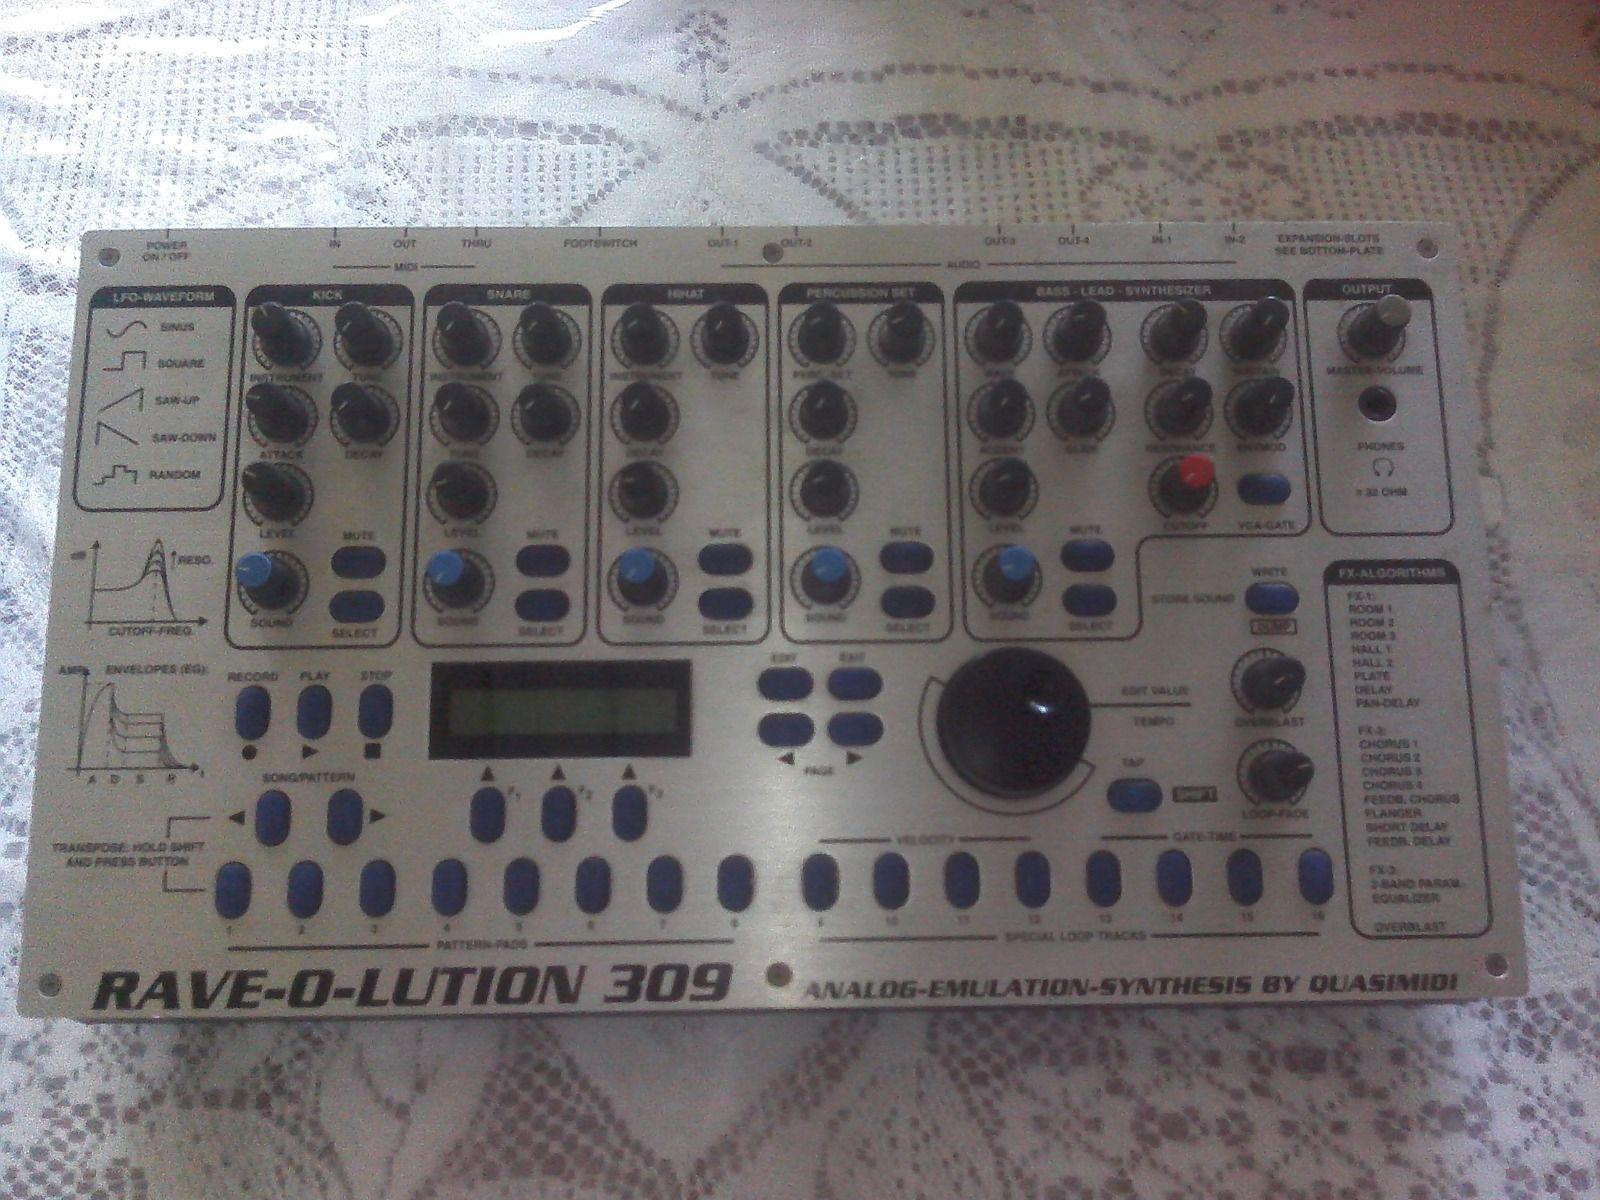 matrixsynth quasimidi rave o lution 309 analog emulation synthesiser drum machine groovebox. Black Bedroom Furniture Sets. Home Design Ideas